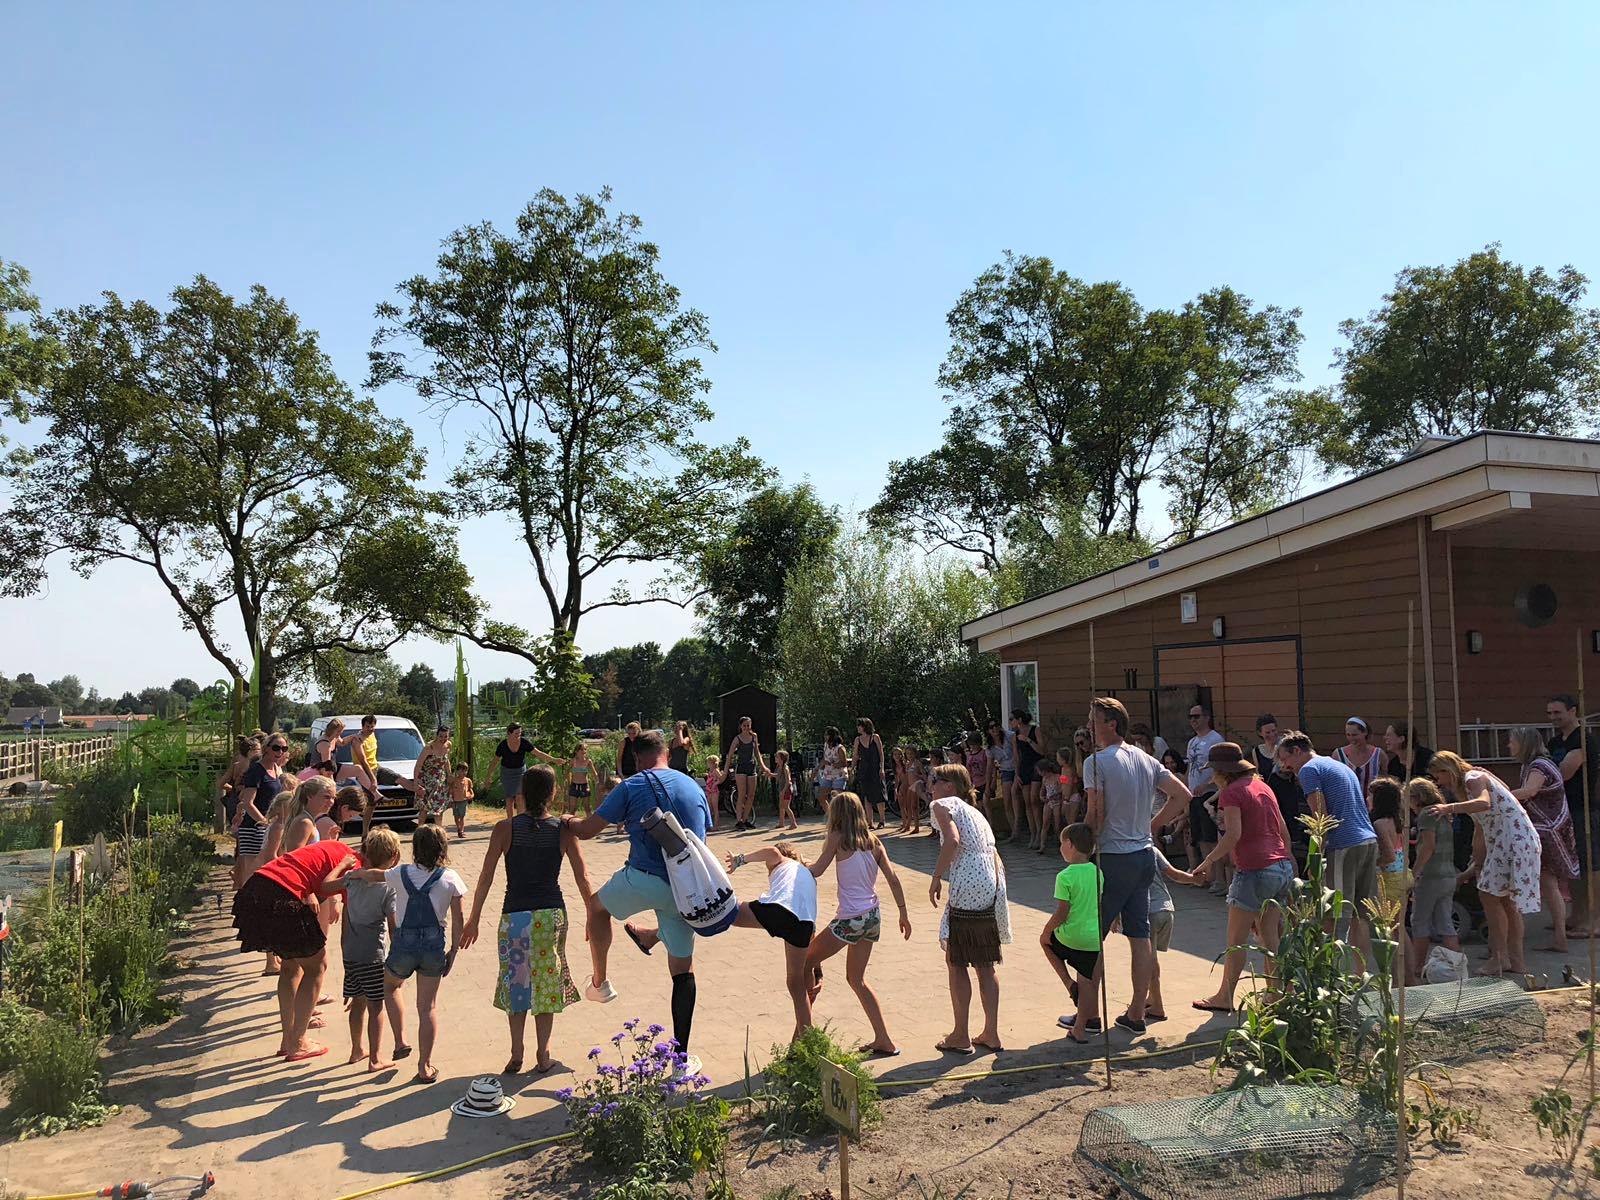 Yogakamp Zomerkamp de Kinderyogatuin Aemstel schooltuin Amsterdam Amstelveen kinderyoga afsluiting